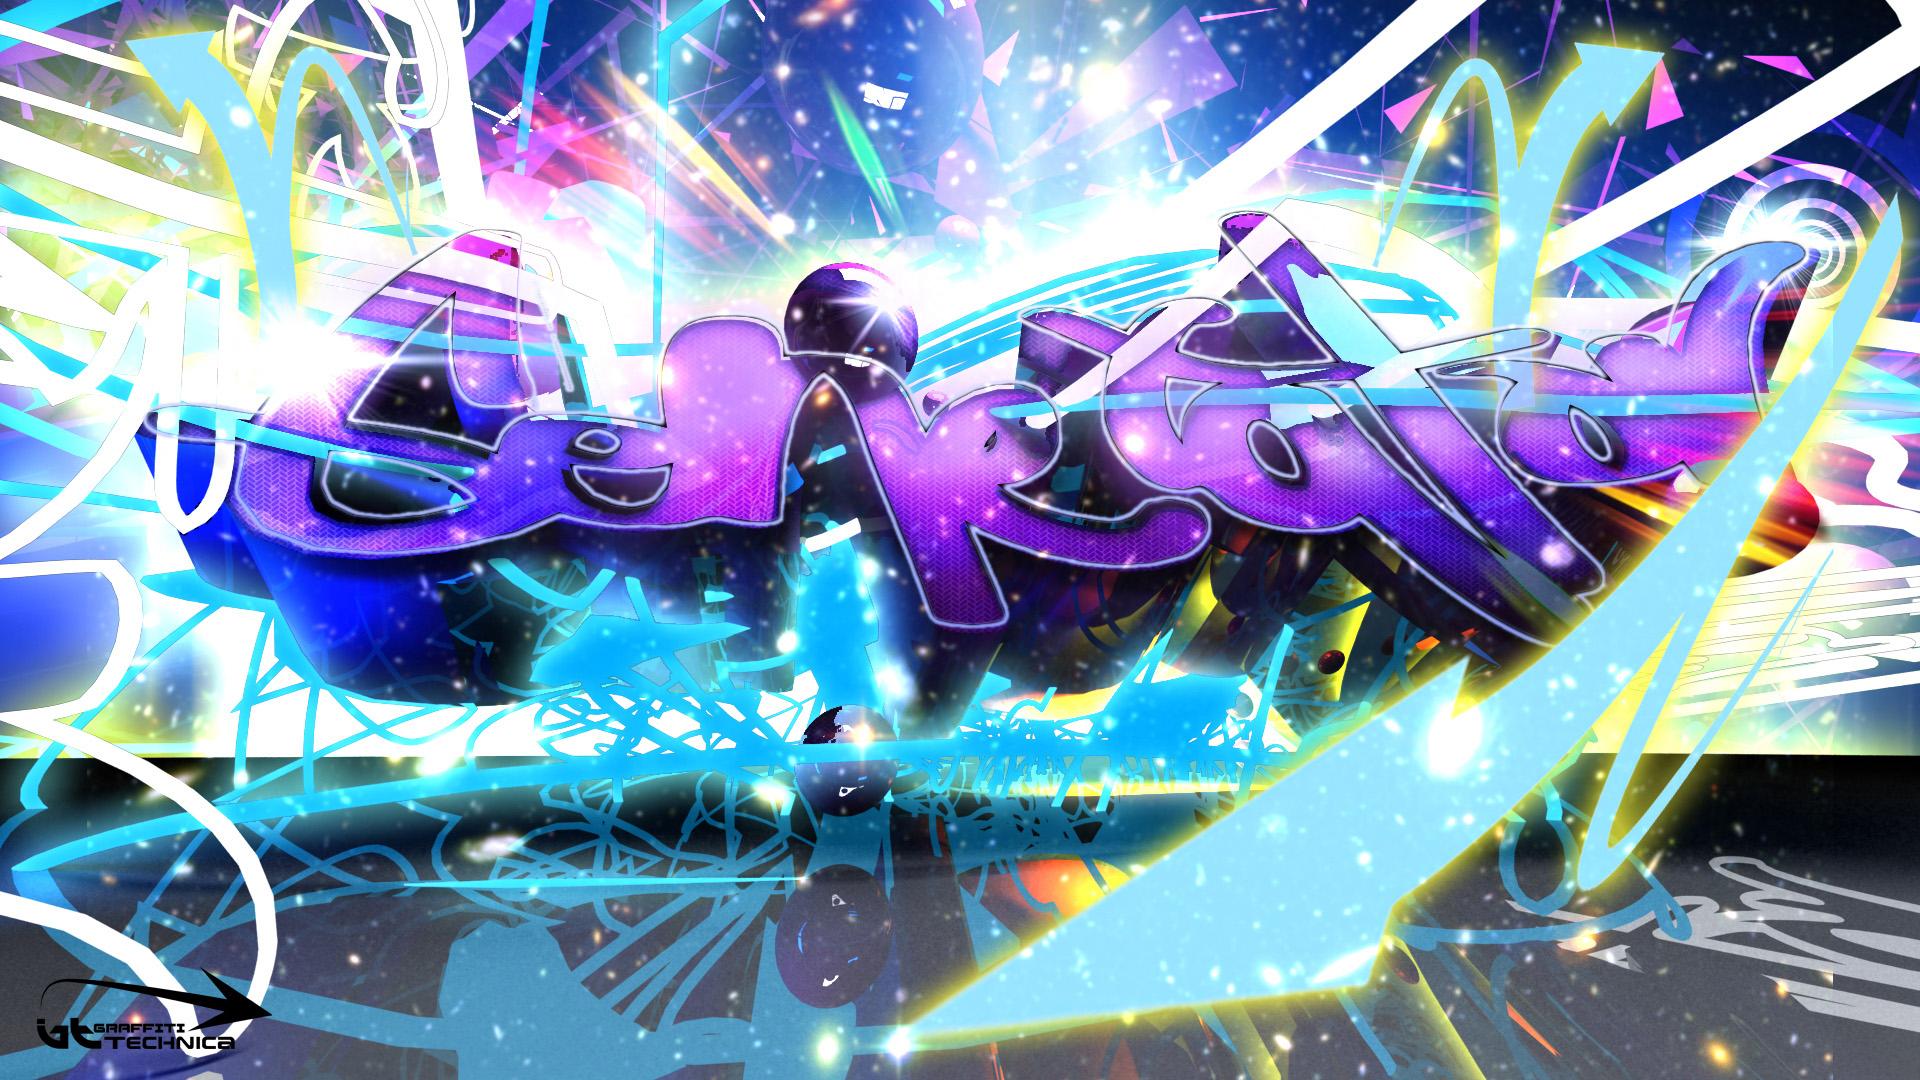 3d graffiti wallpaper graffiti generator · 3d graffiti wallpaper downloads